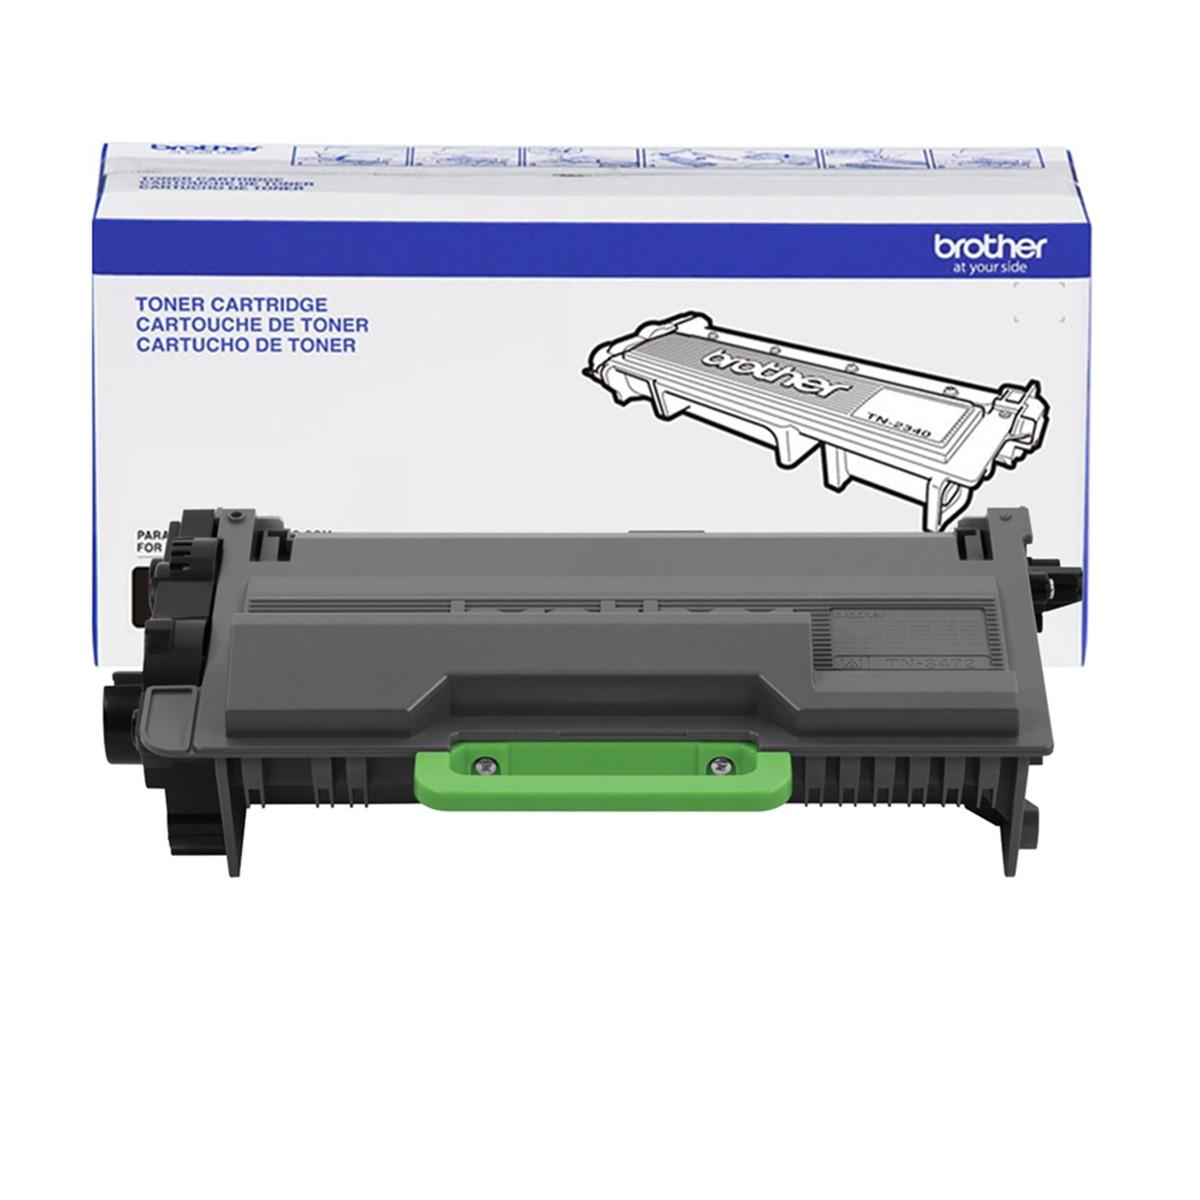 Toner Brother TN3422 TN3422BR | HL-L5102DW DCP-L5502DN DCP-L5652DN MFC-L5702DW | Original 3k